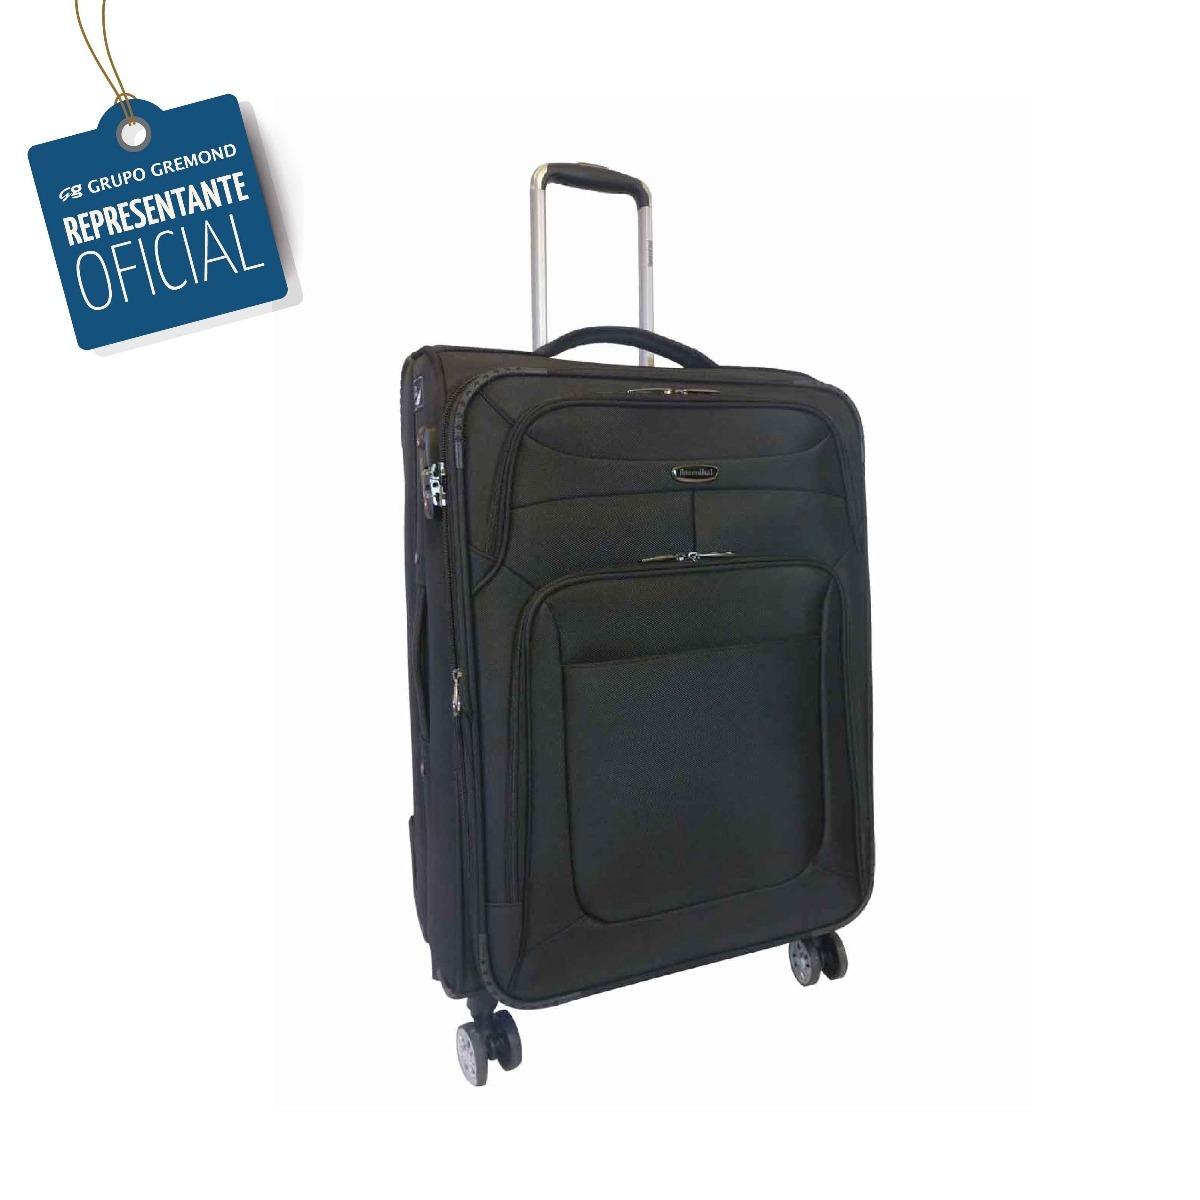 c25db668f valija de viaje grande 28´ rosenthal 4 ruedas maletas outlet. Cargando zoom.